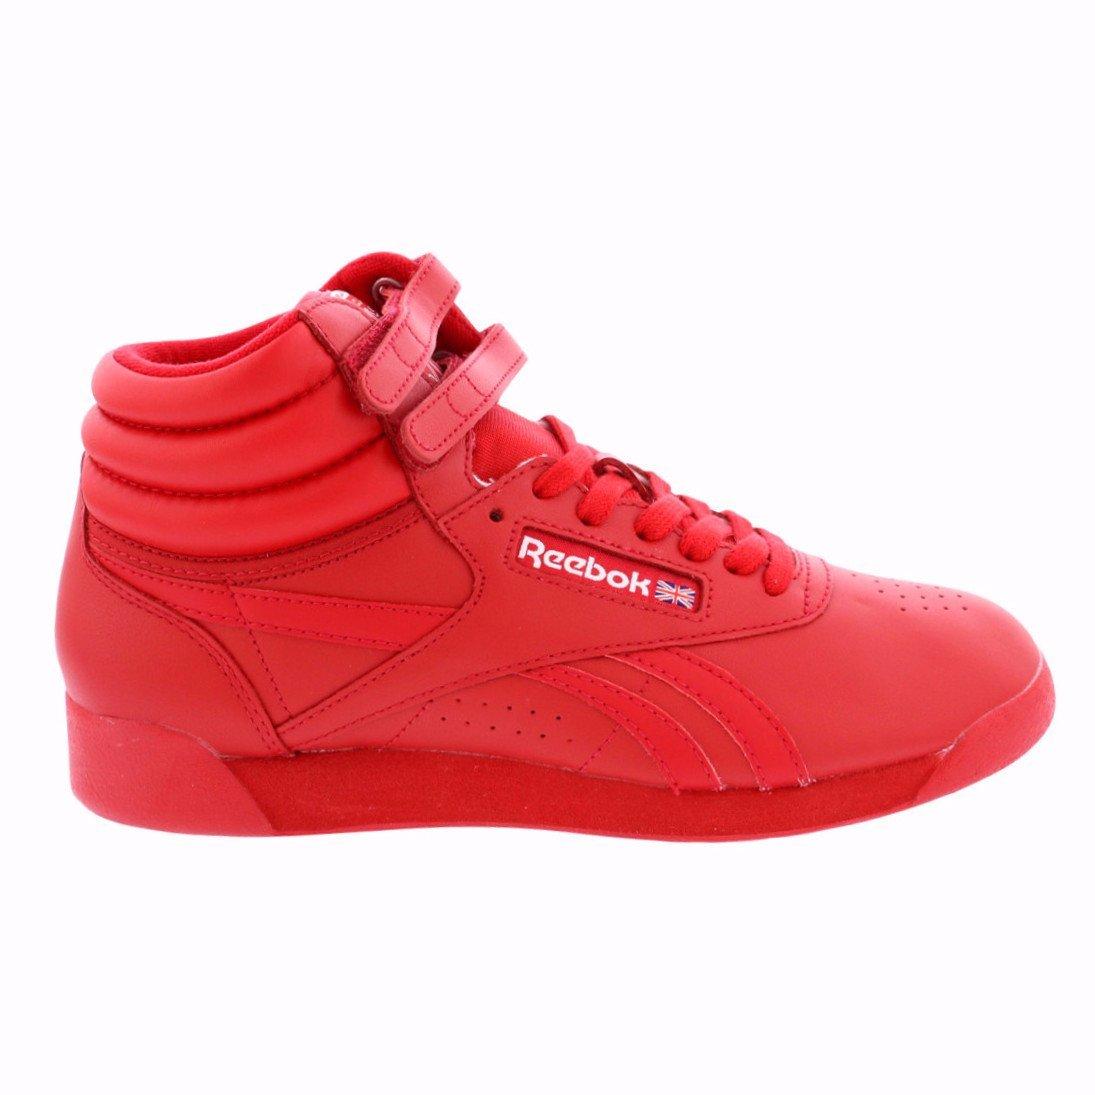 Reebok Women's F/S Hi Spirit Sneaker, Excellent Red/White, 8.5 M US